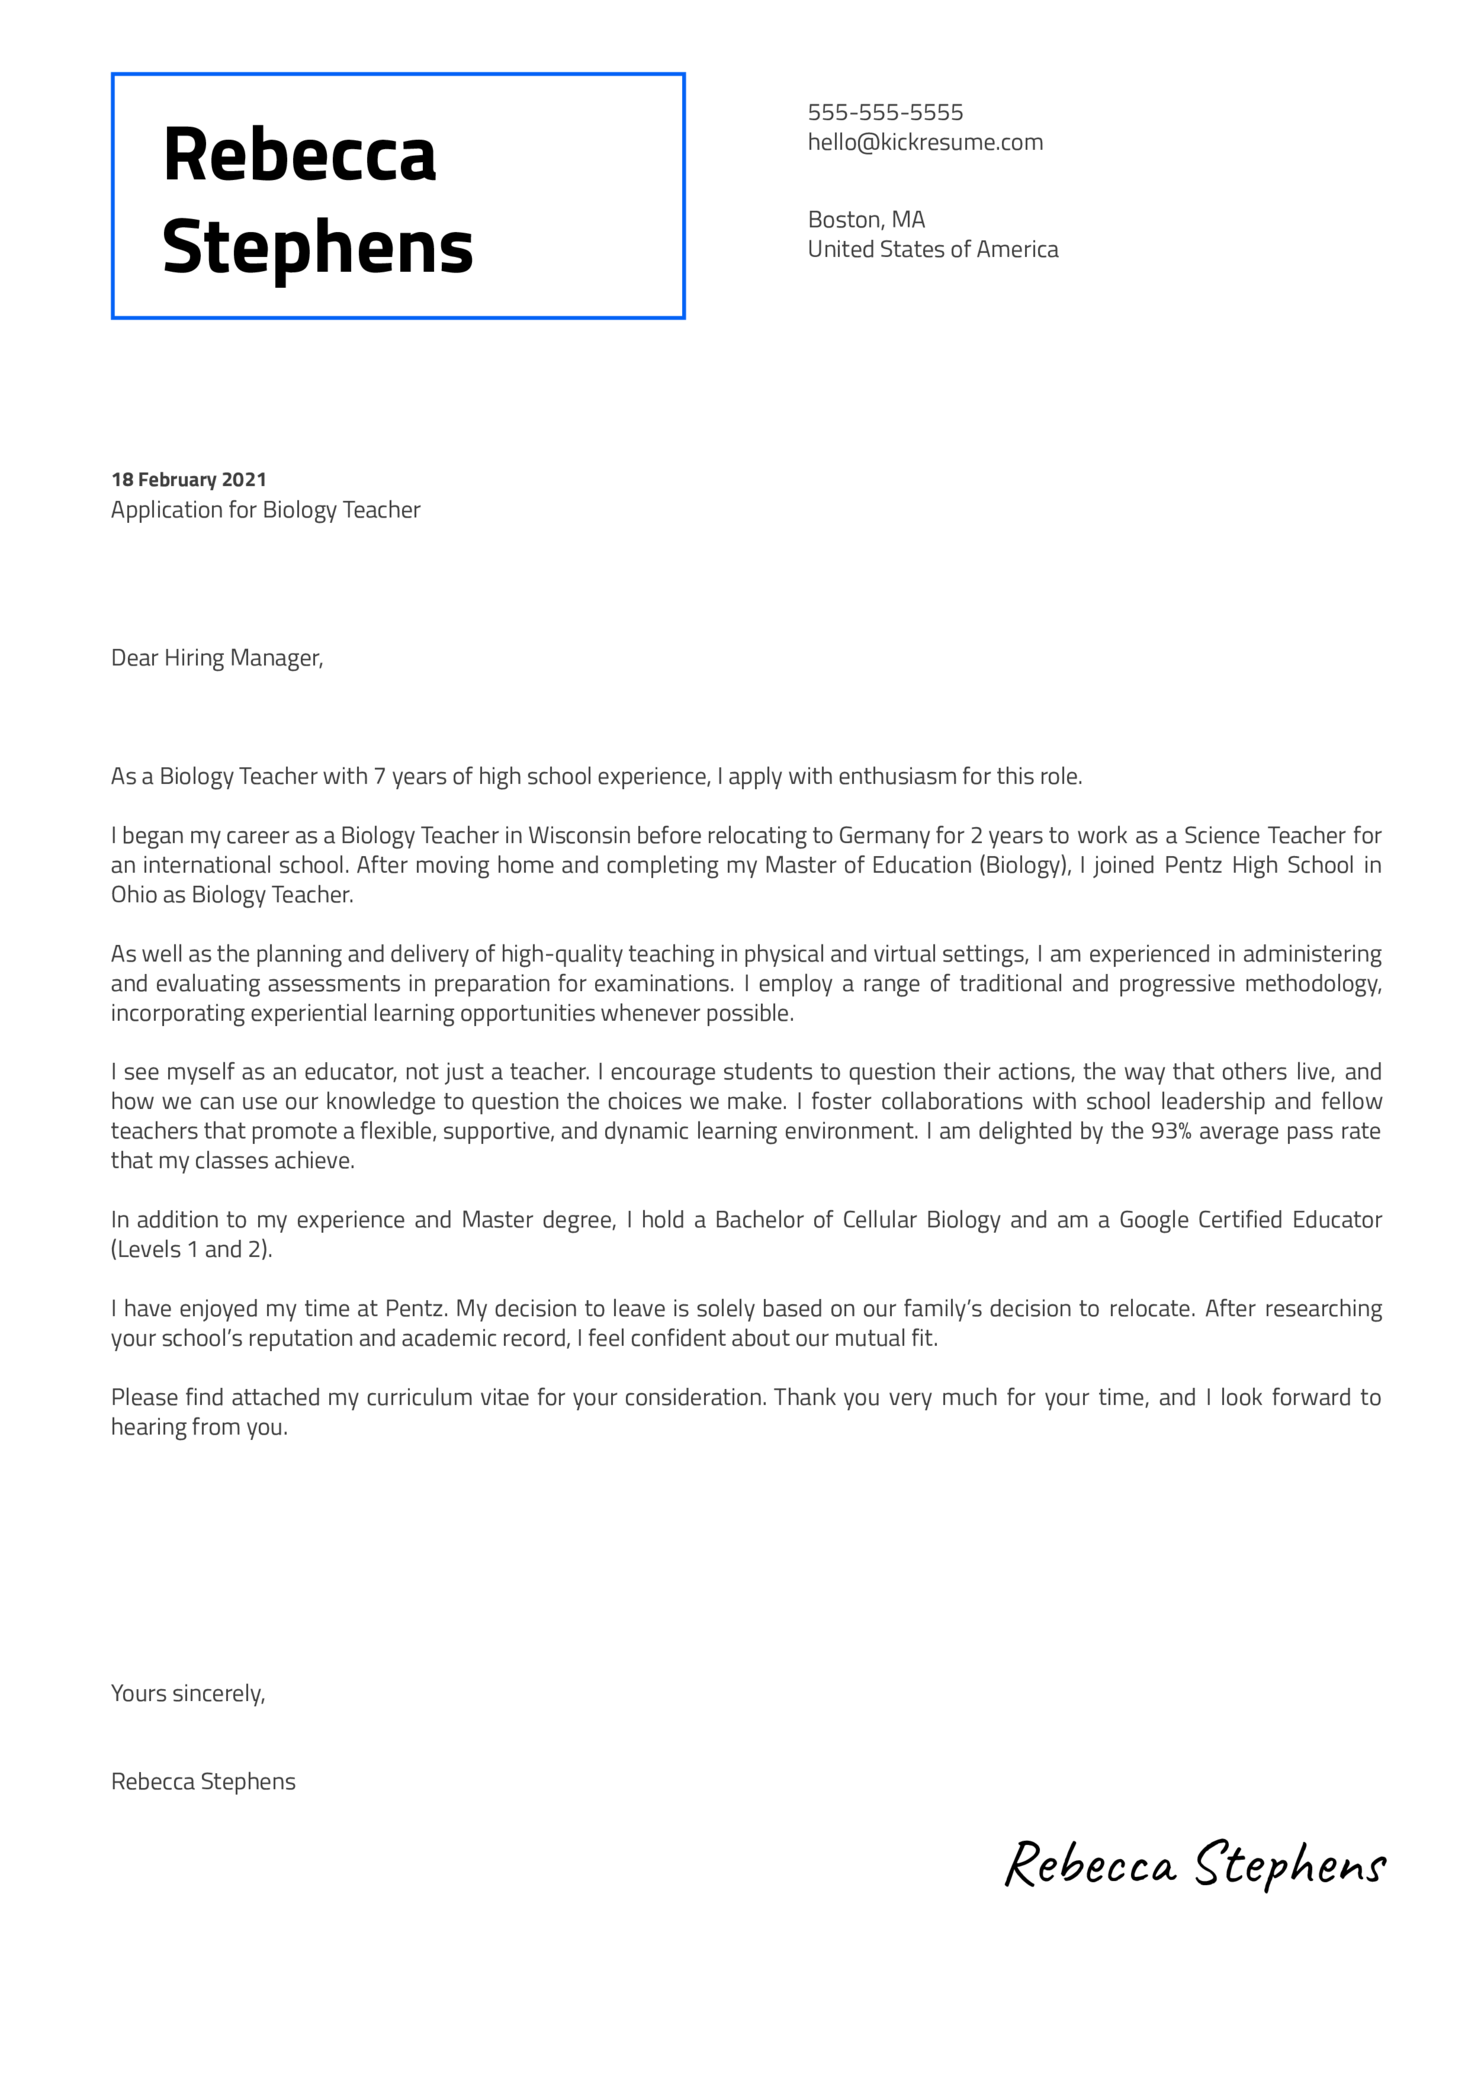 Biology Teacher Cover Letter Template